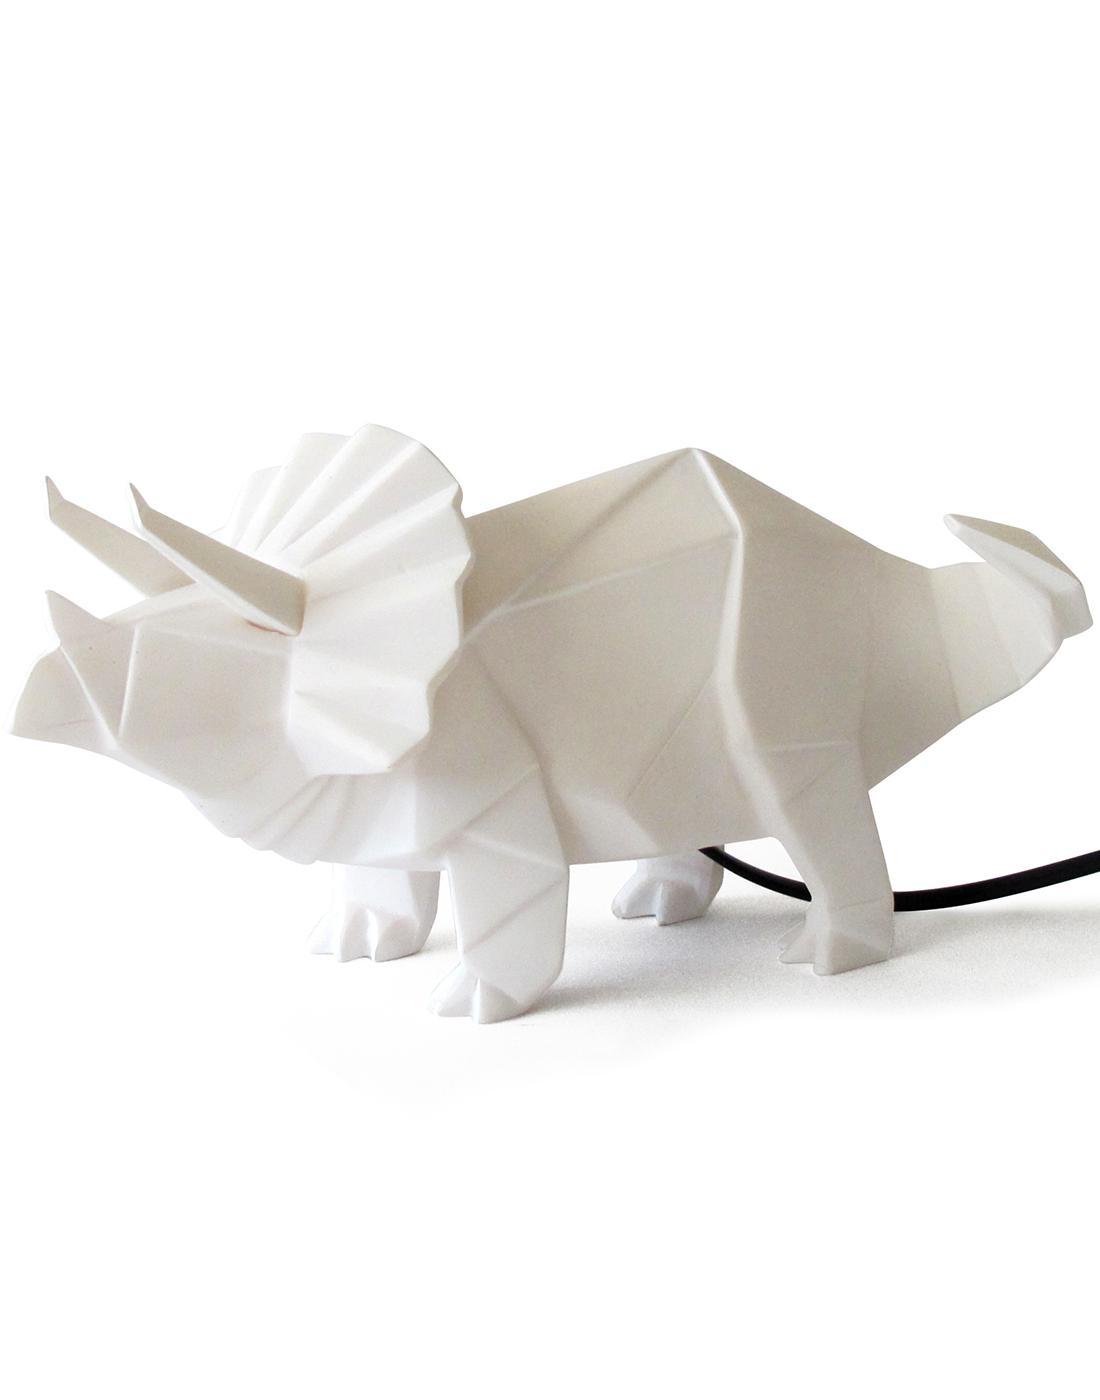 DISASTER DESIGNS Triceratops Dinosaur Origami Lamp